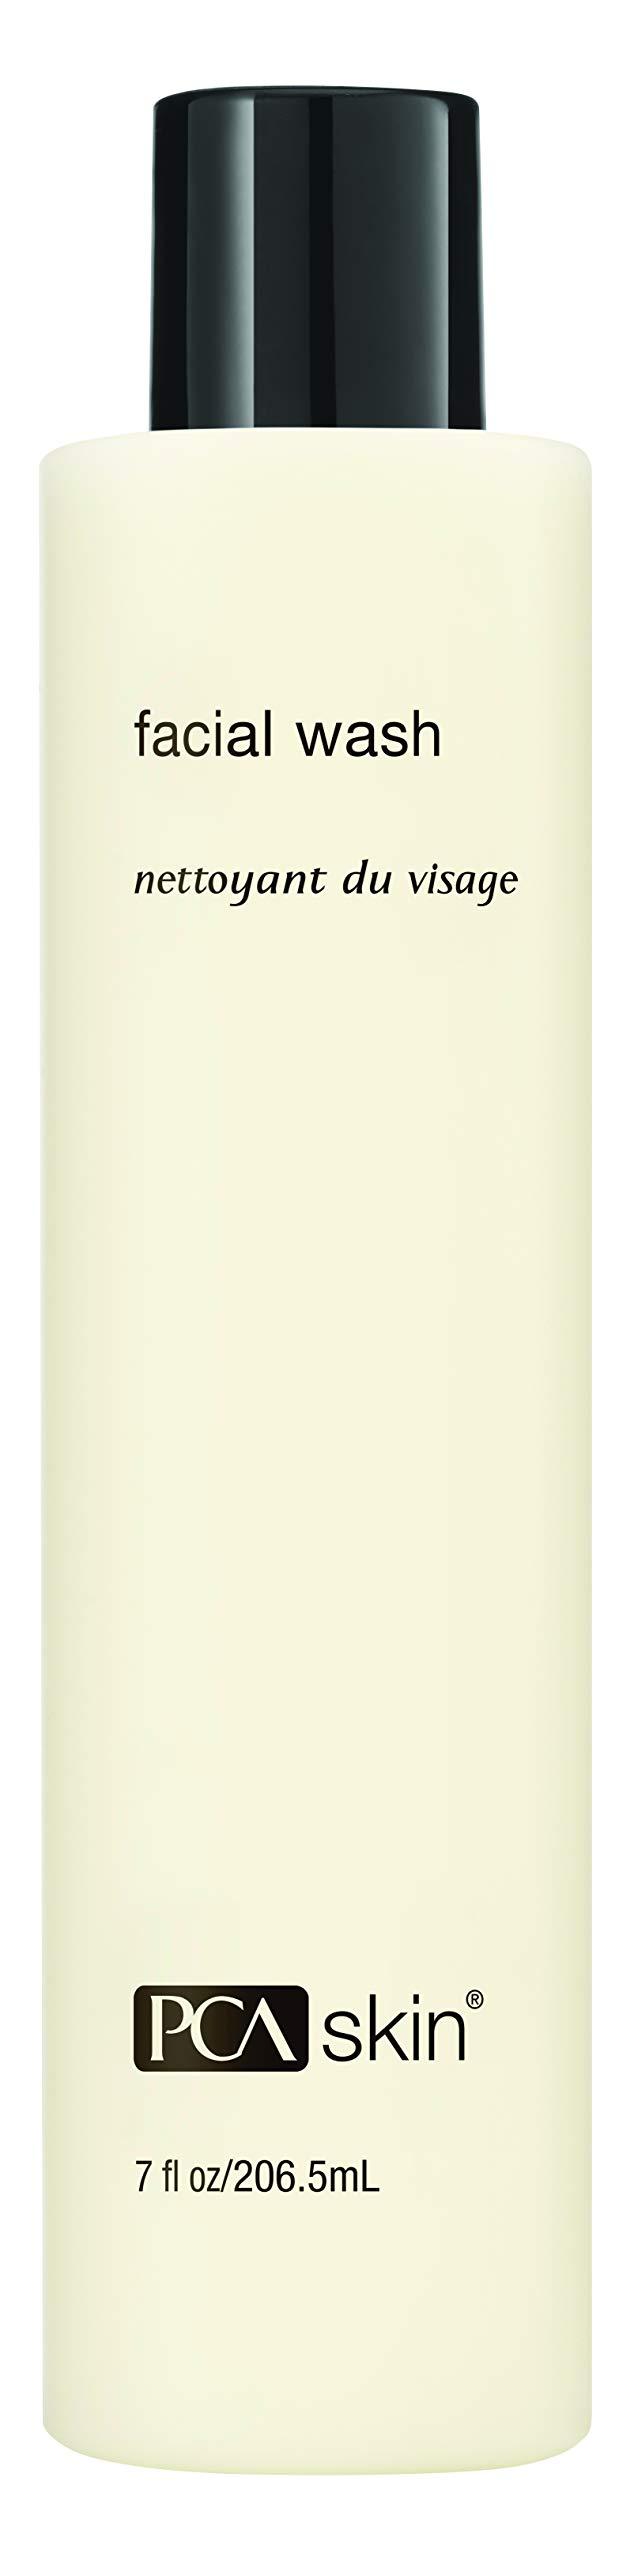 PCA SKIN Face Wash - Gentle Lactic Acid Facial Cleanser (7 oz)